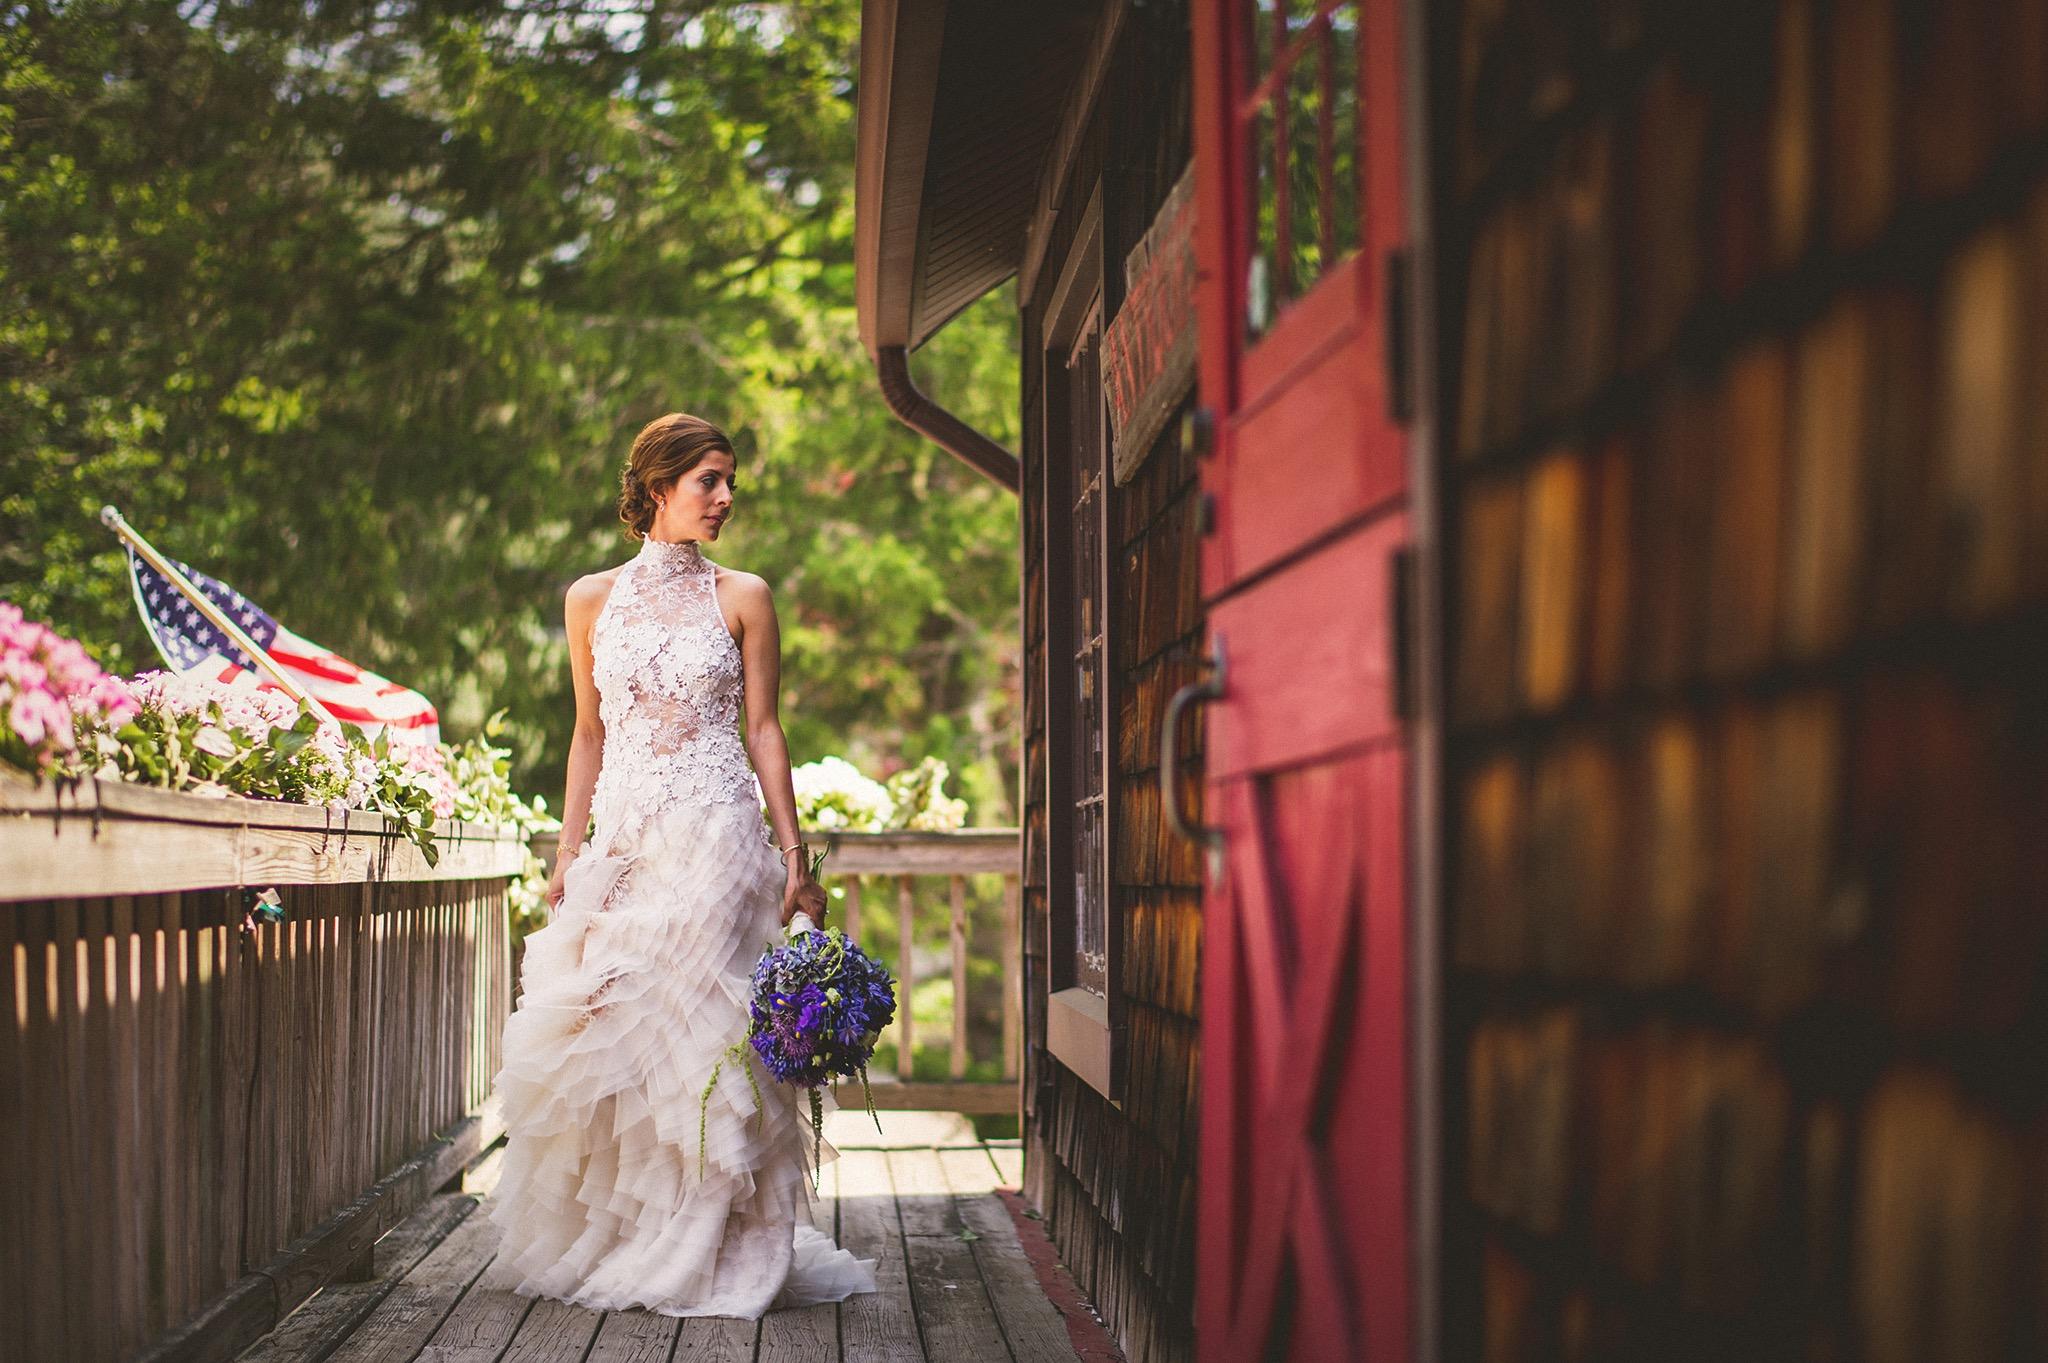 36-model-bride.jpg